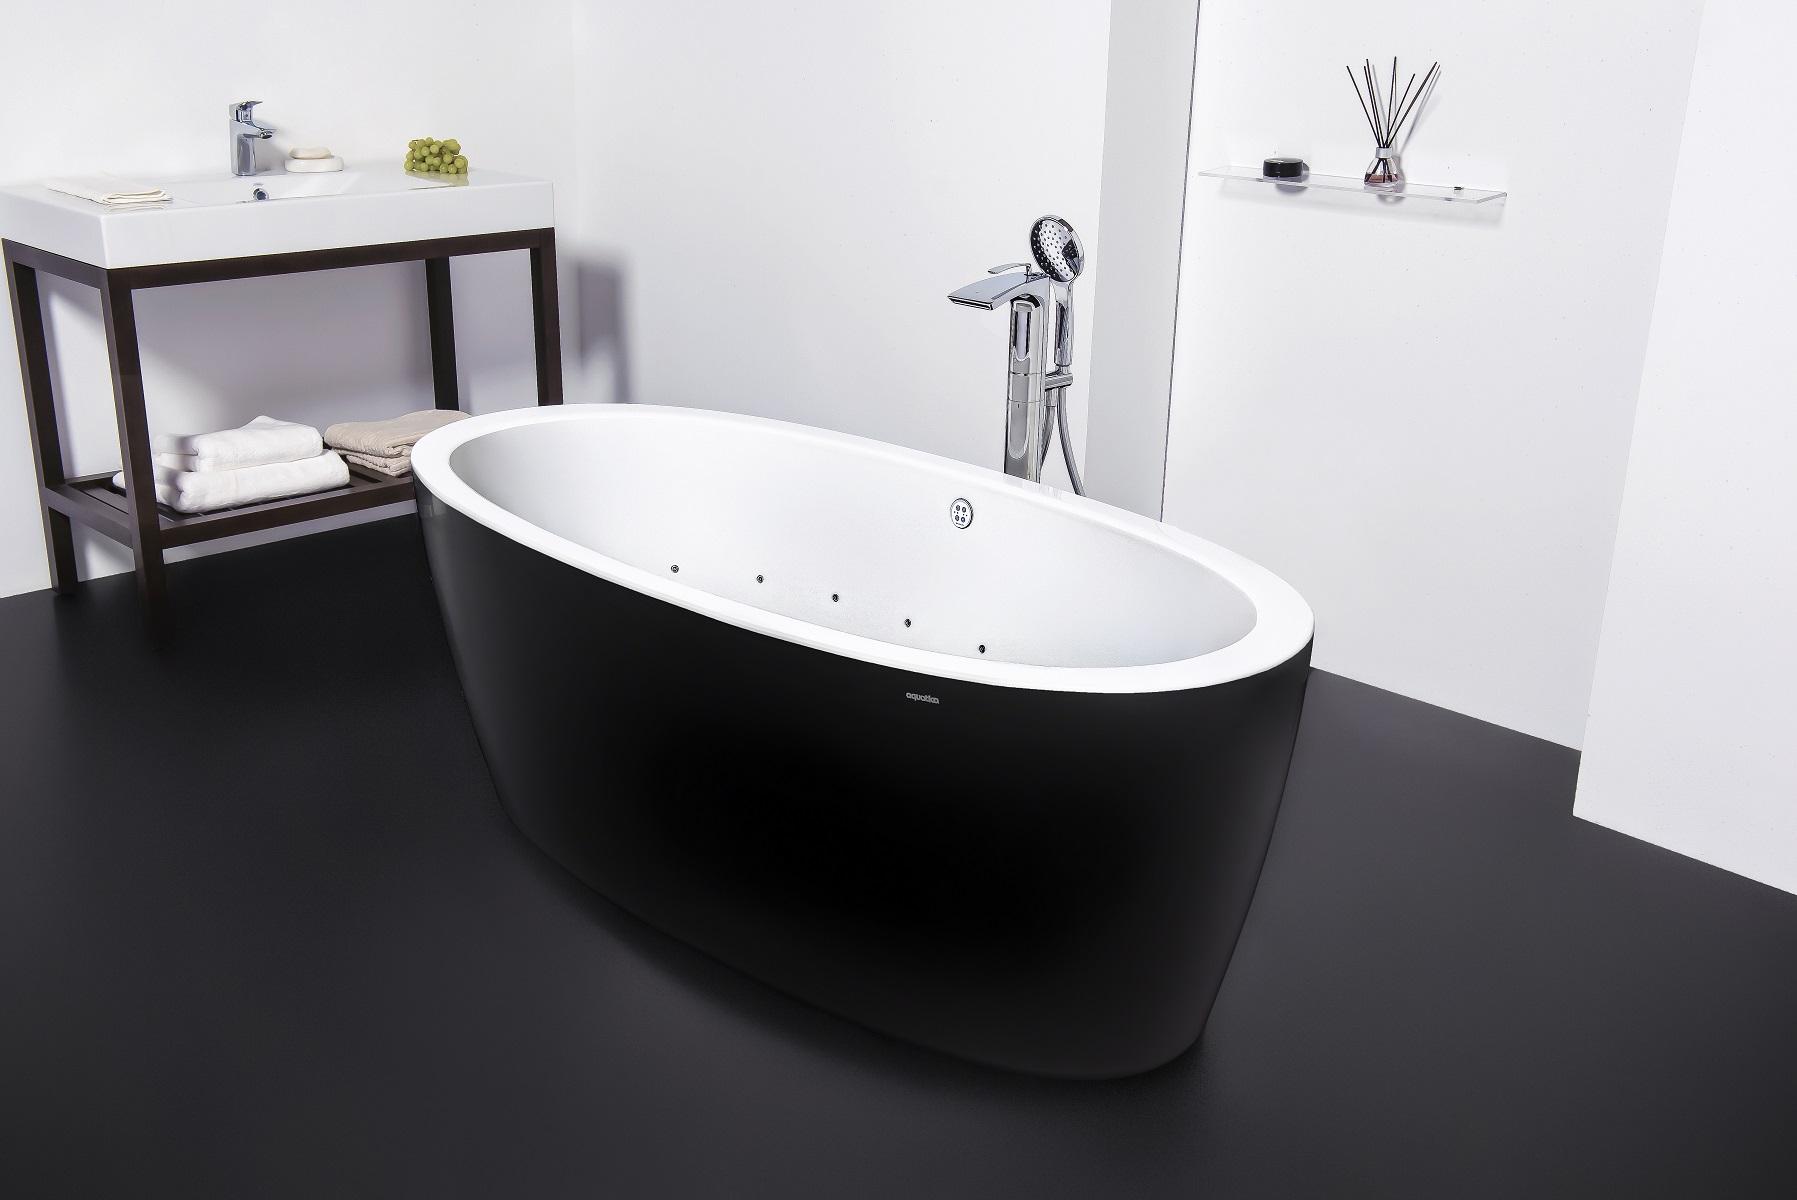 Purescape 174A Blck Wht Relax Air Massage Bathtub by Aquatica DSC2814 web